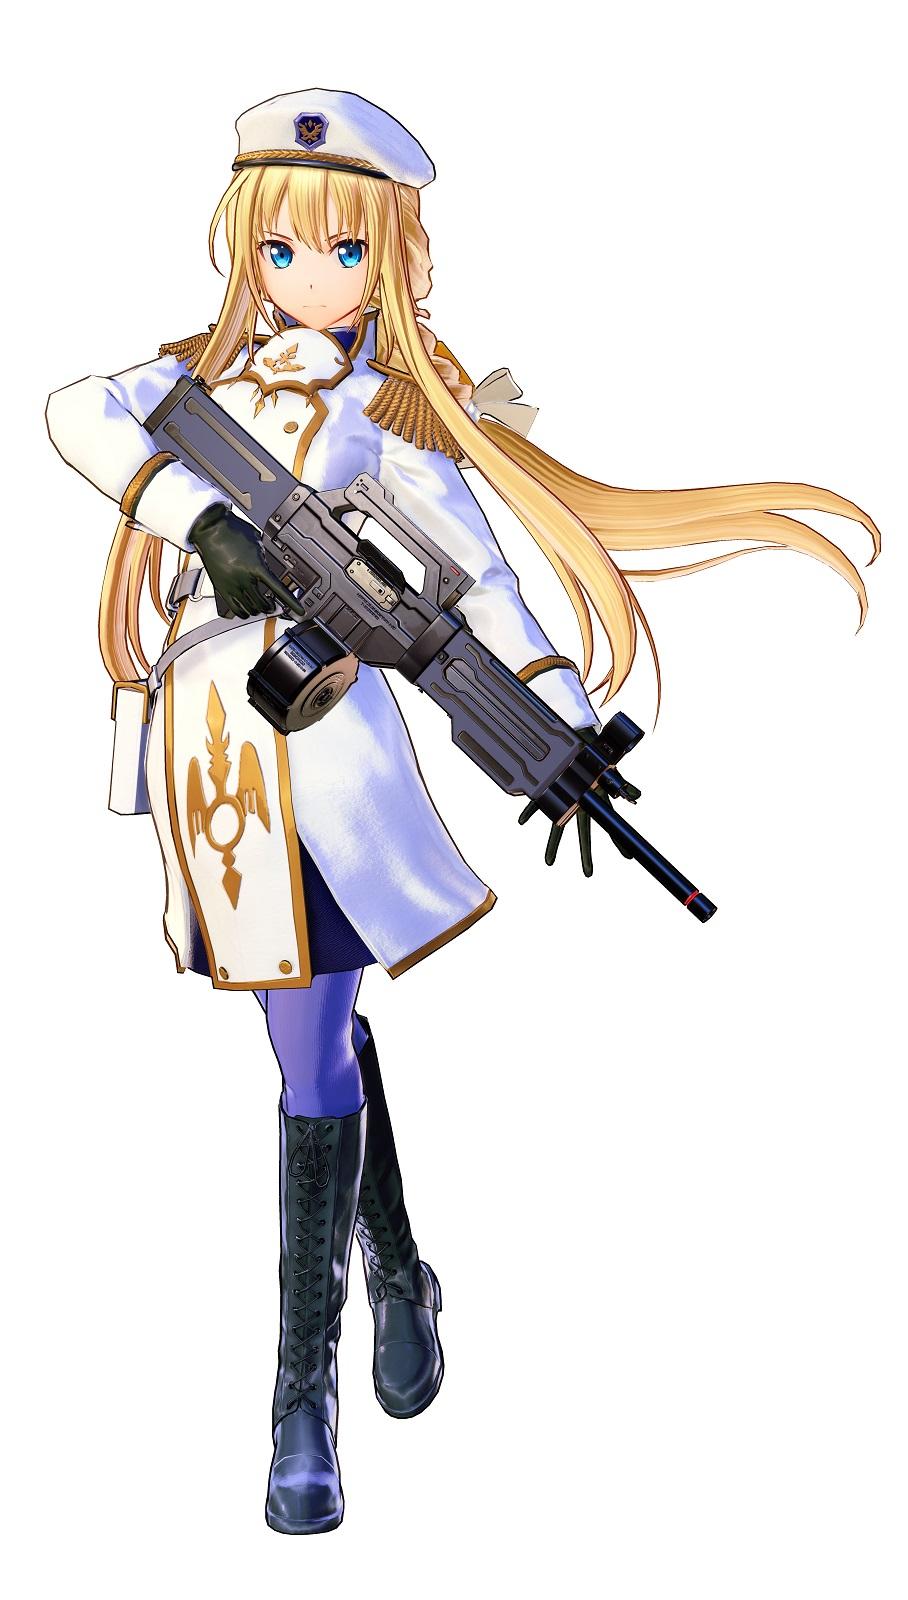 Sword Art Online: Fatal Bullet Season Pass Detailed